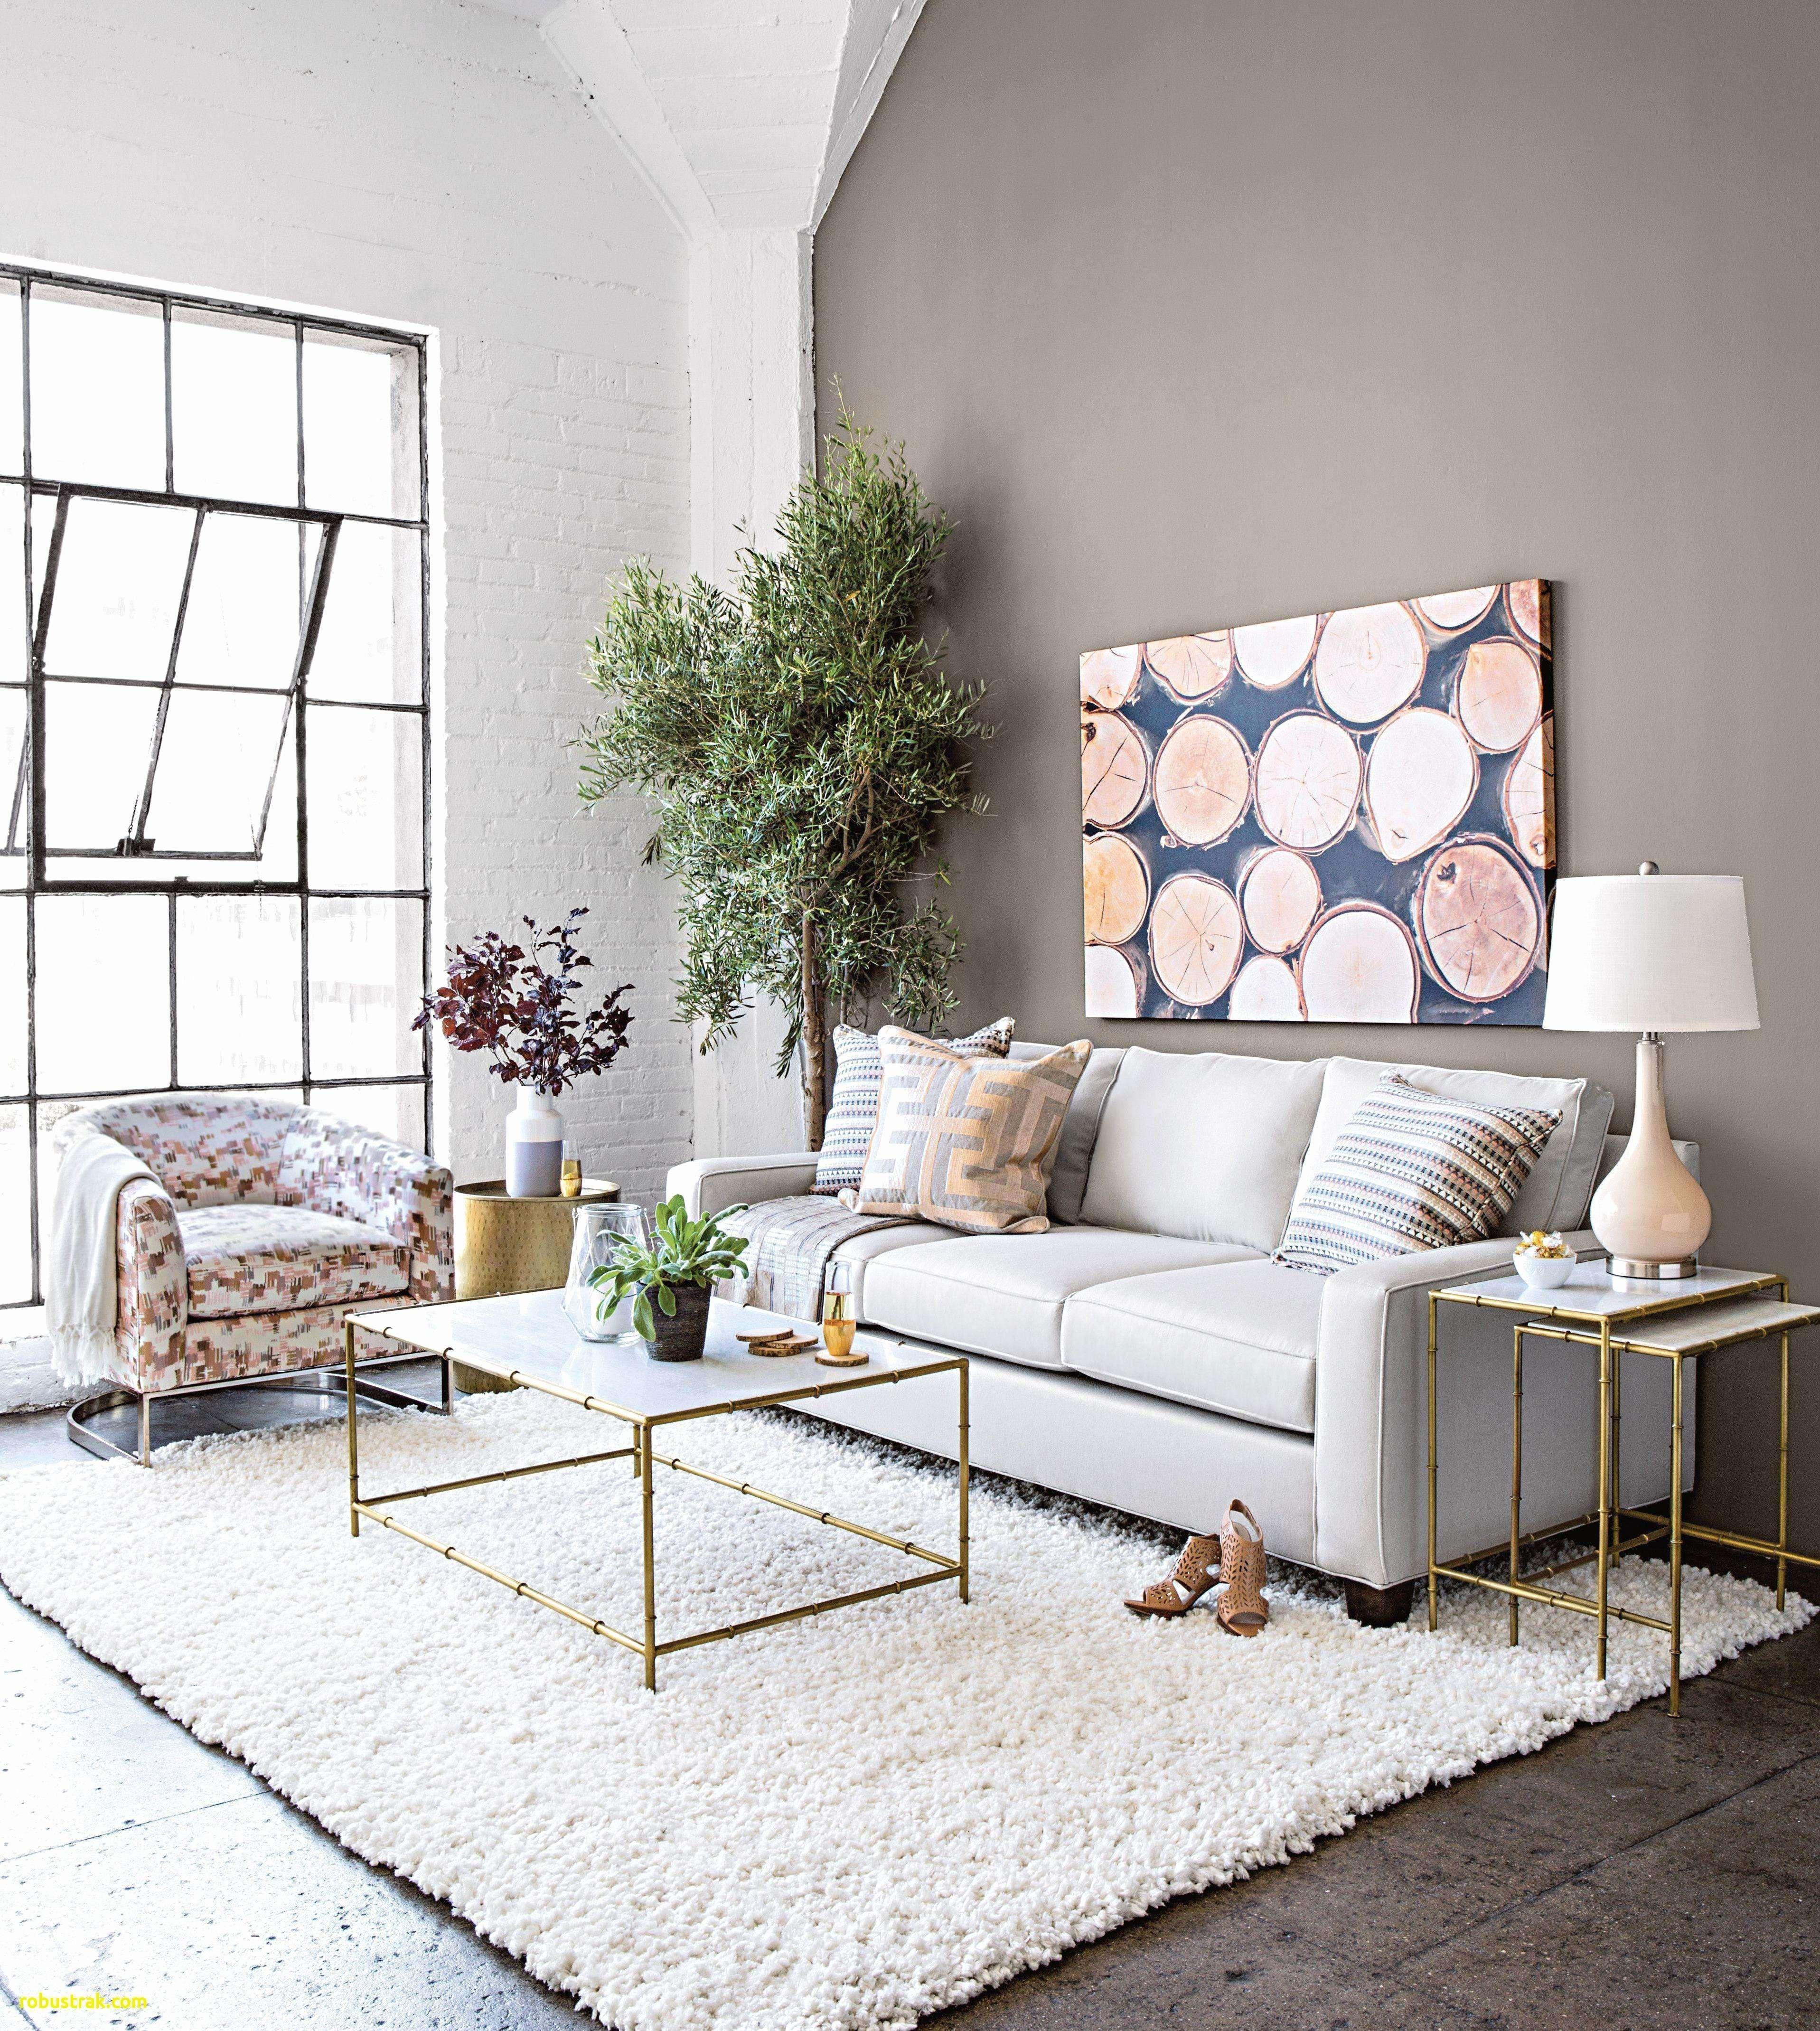 Pinterest Best Diy Home Decor Luxury Unique Rustic Outdoor Decor Pinterest Black Living Room Living Room White Yellow Living Room